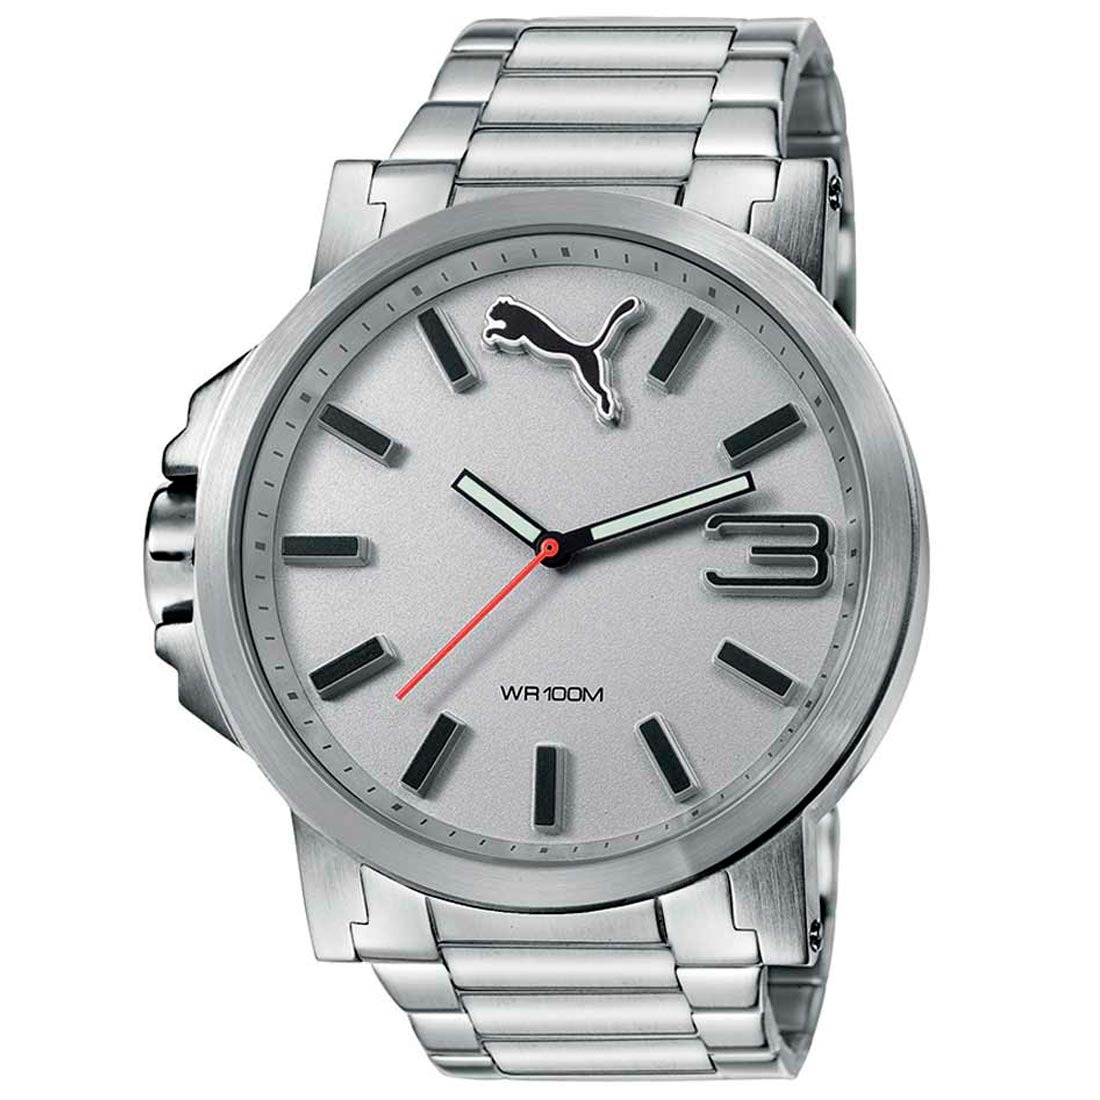 373d39cdc37 Relógio Analógico Puma Uiltrasize